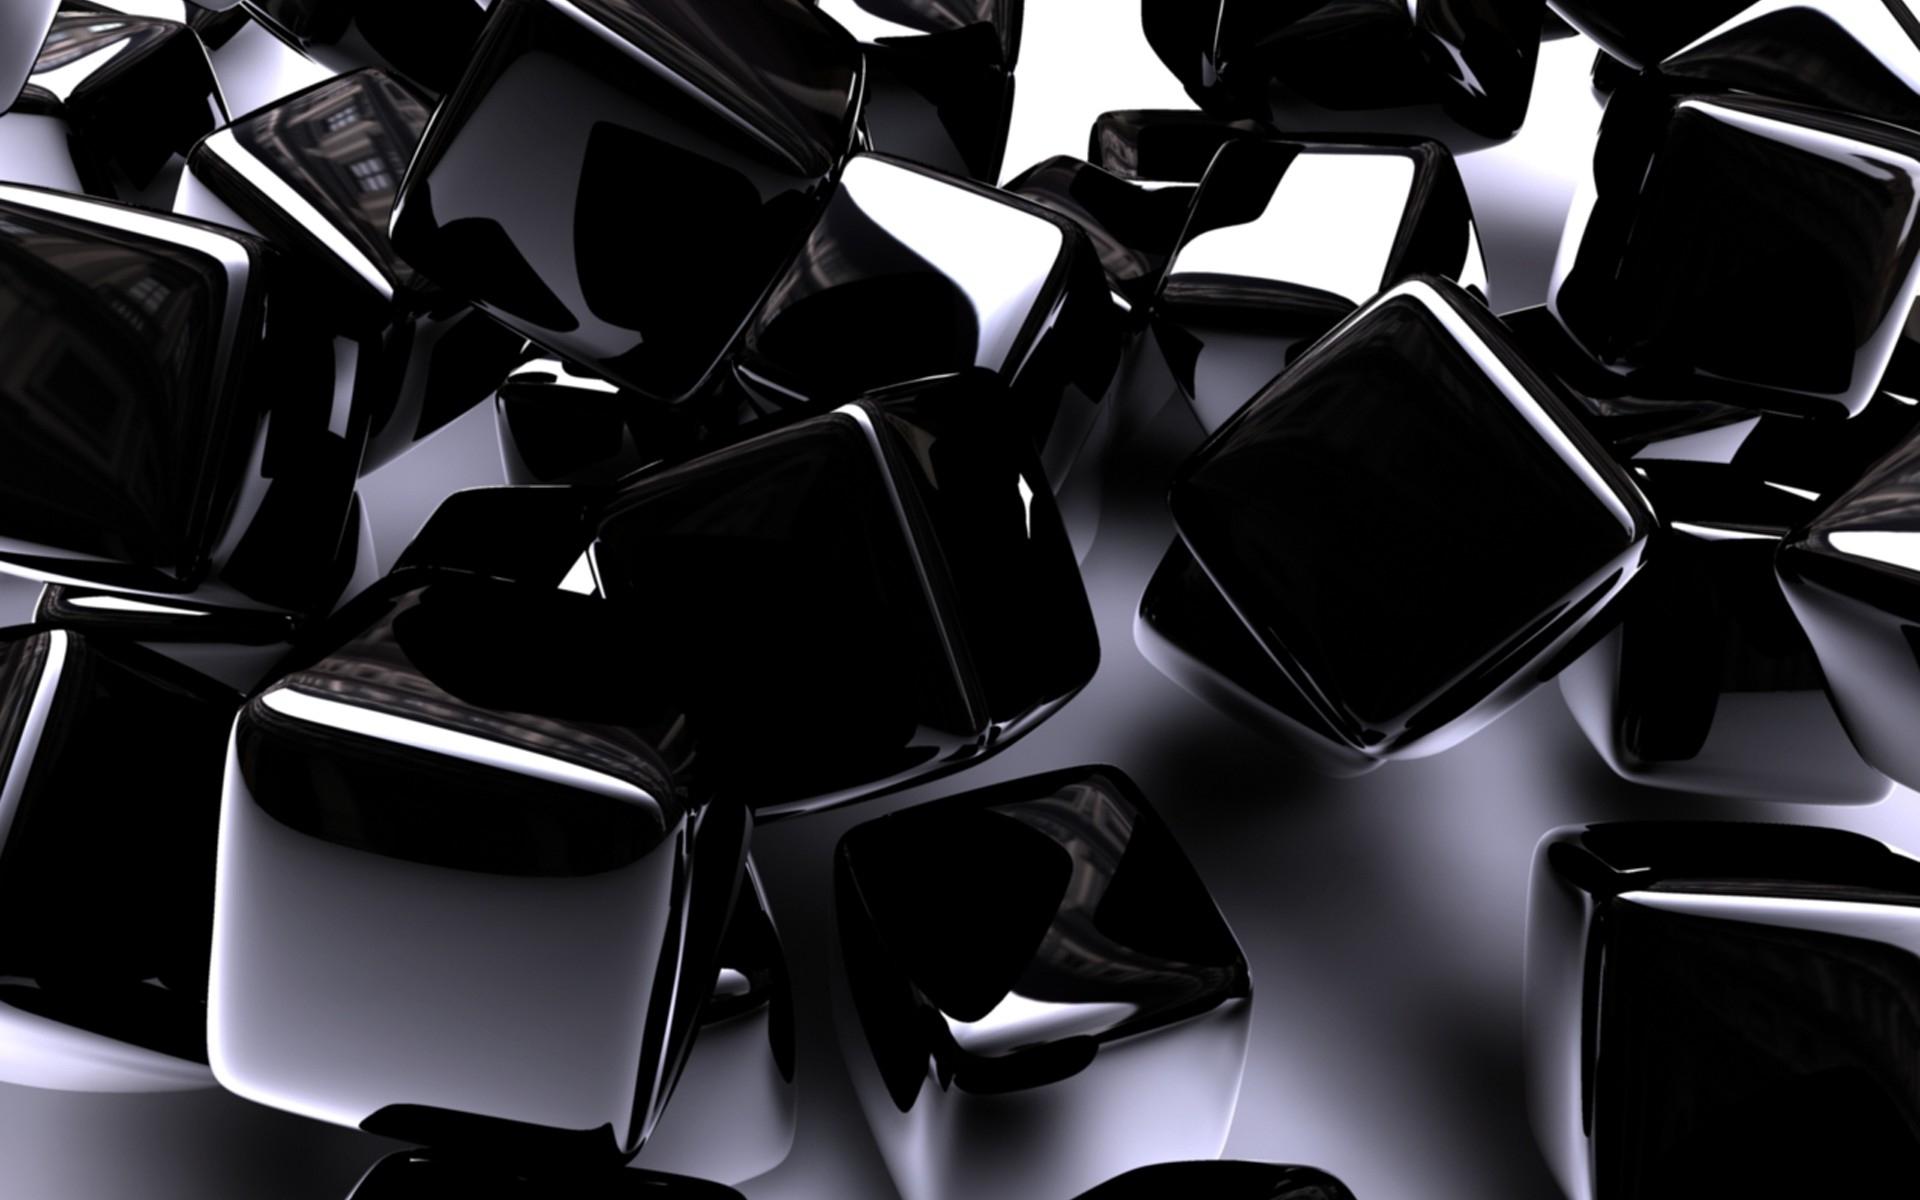 1920x1200 Px Abstract ART Black Chrome Cube Digital Pattern Shine Square